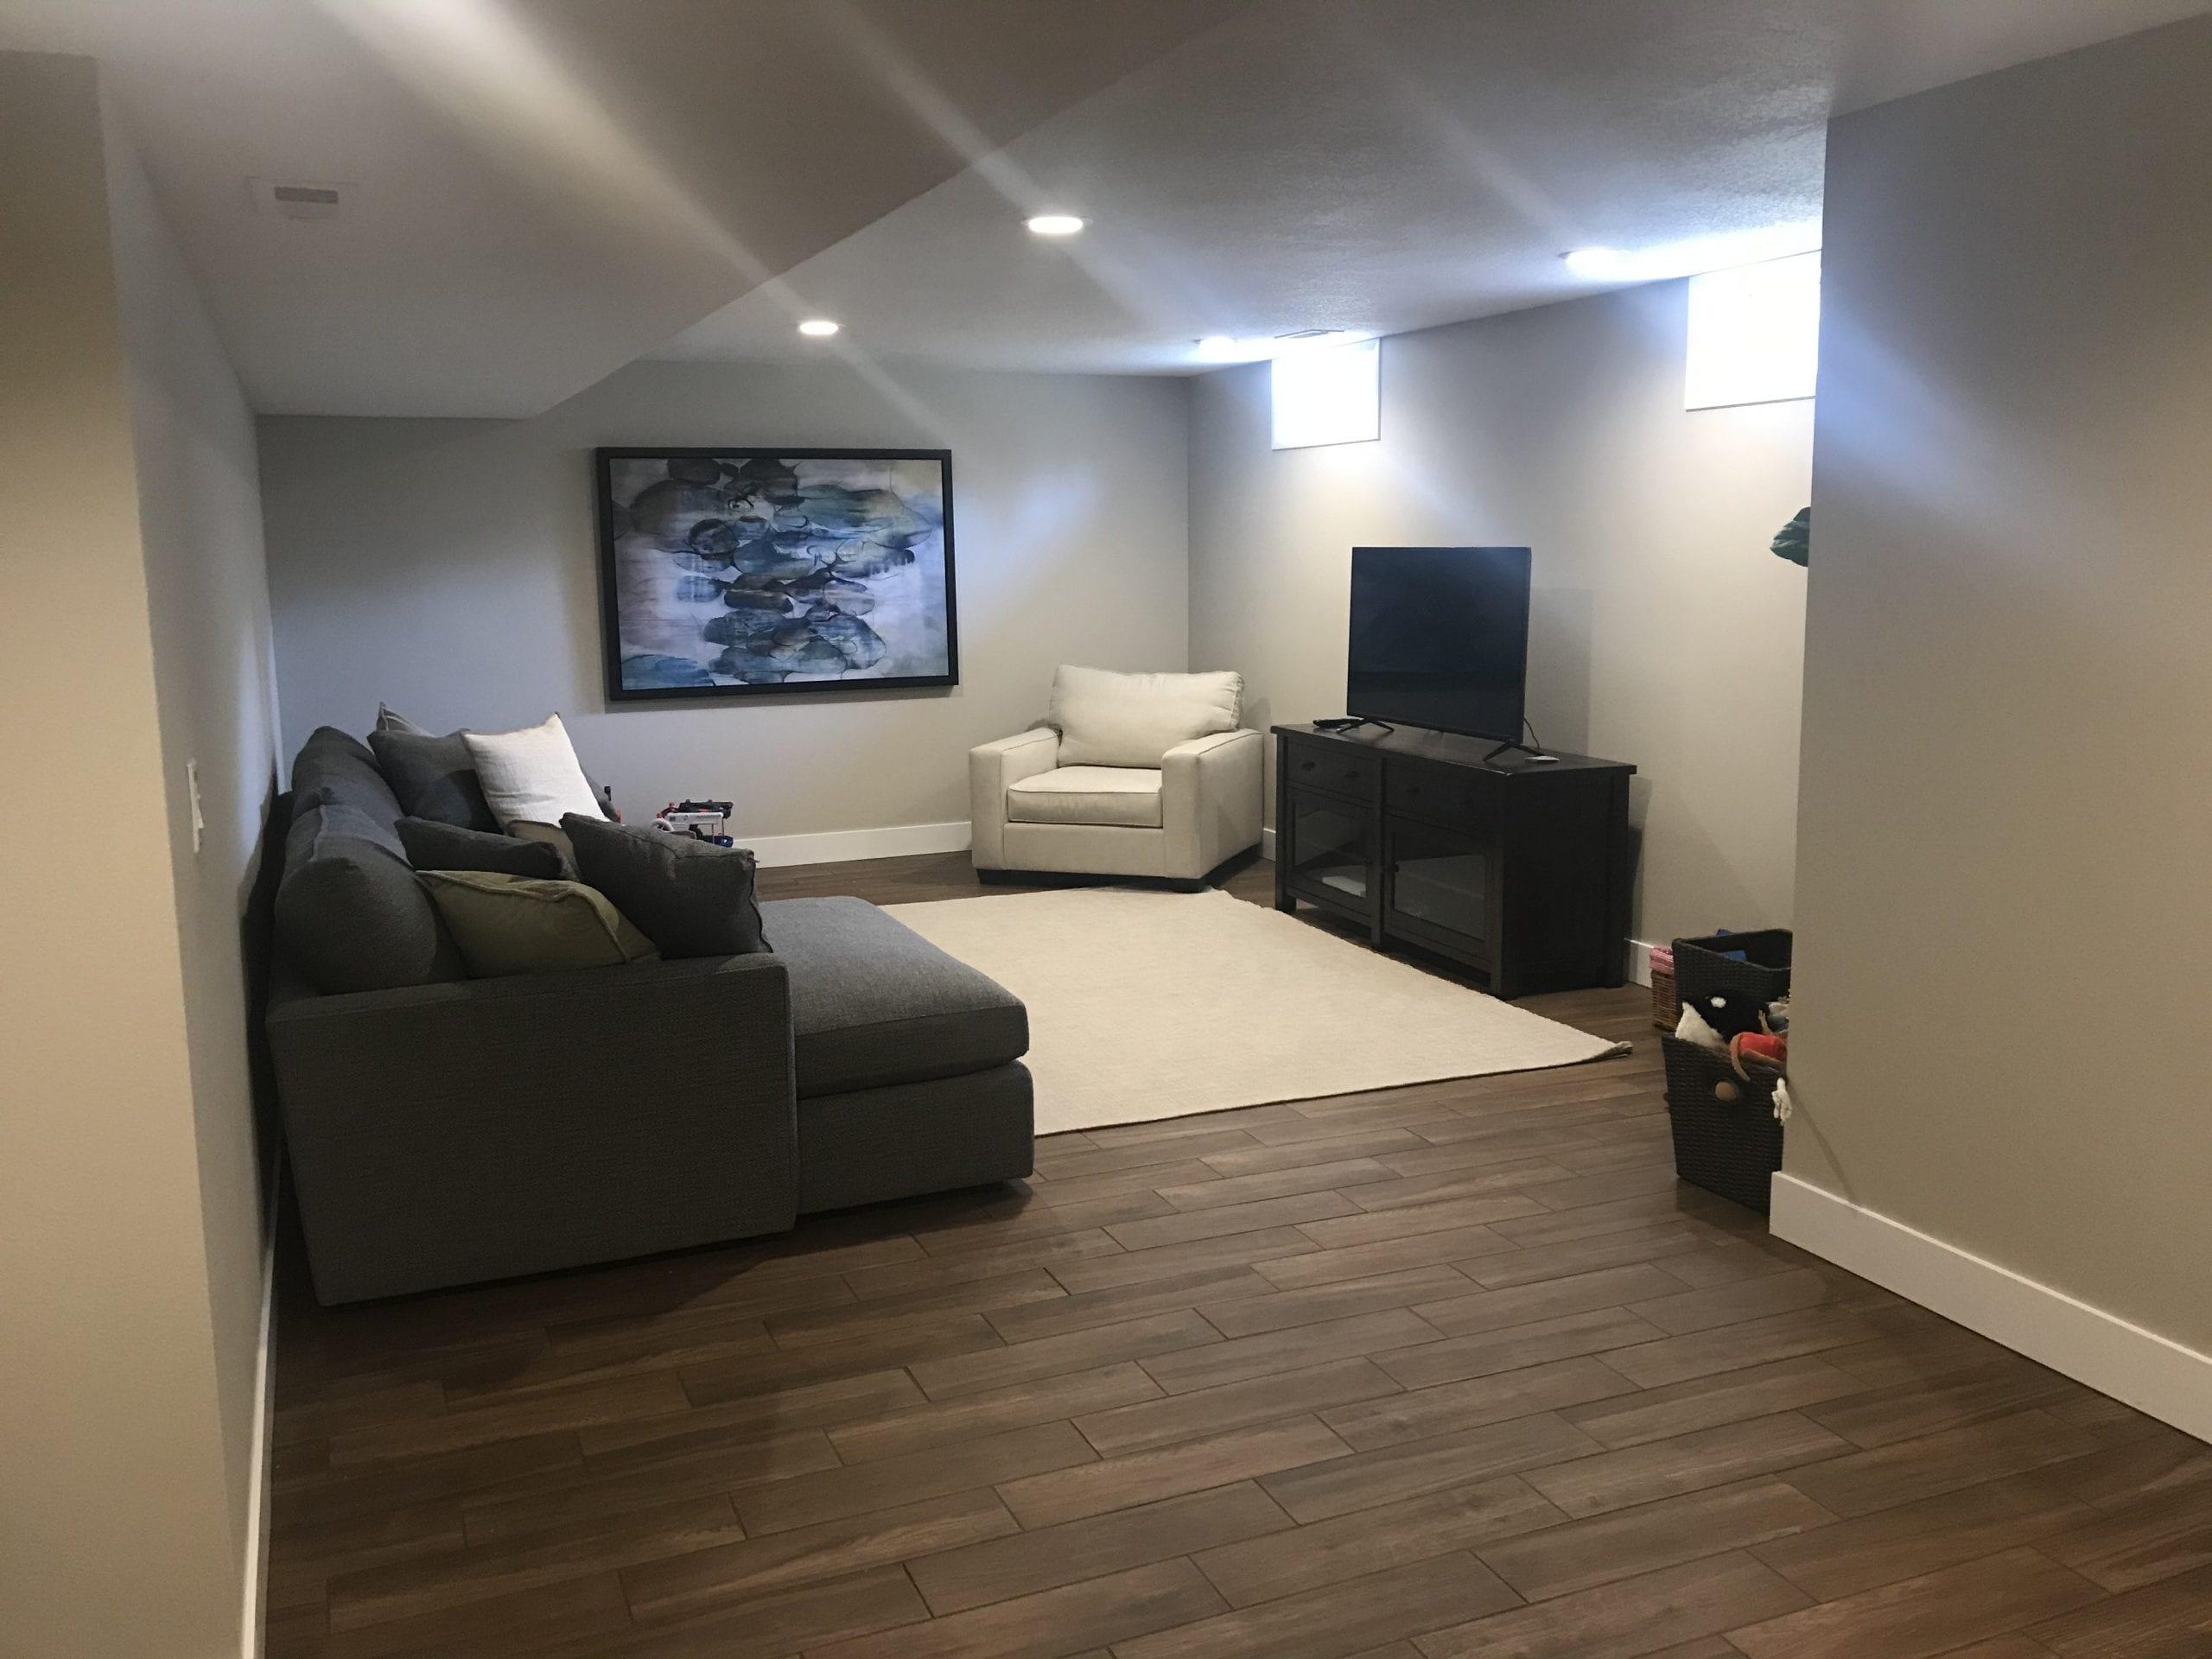 Finished Basement Remodel - West Des Moines Iowa - Tile Floor